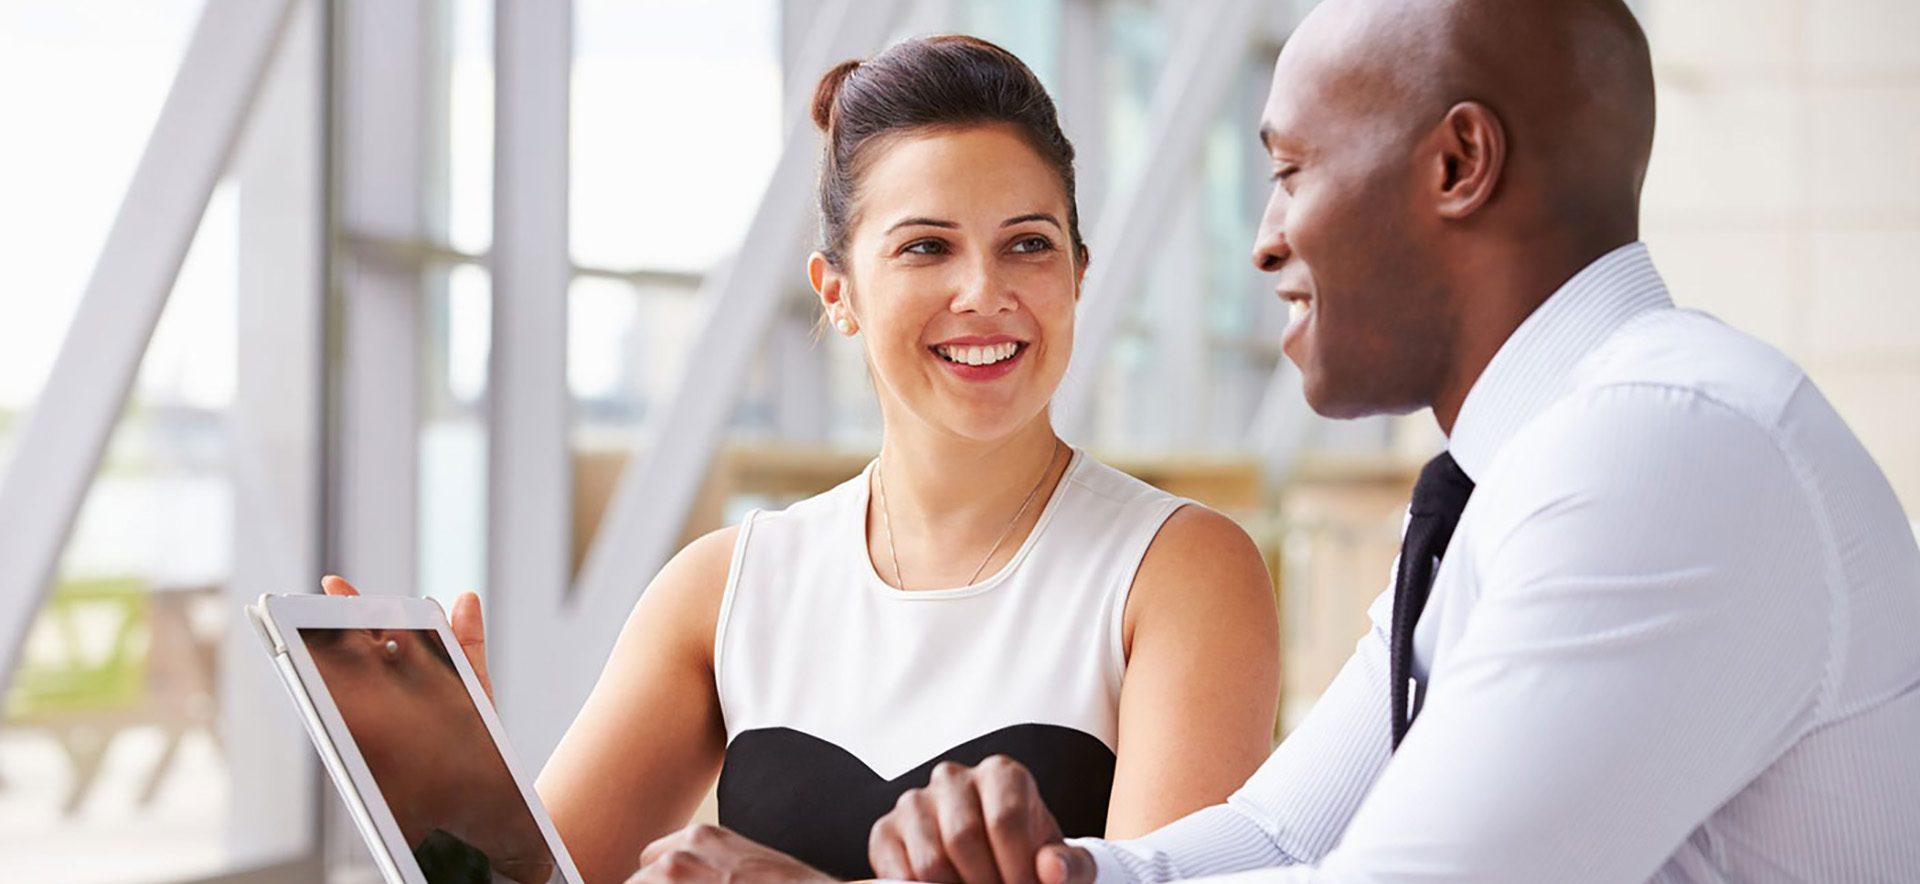 Human resources professional ges419 aspect ratio 100 46